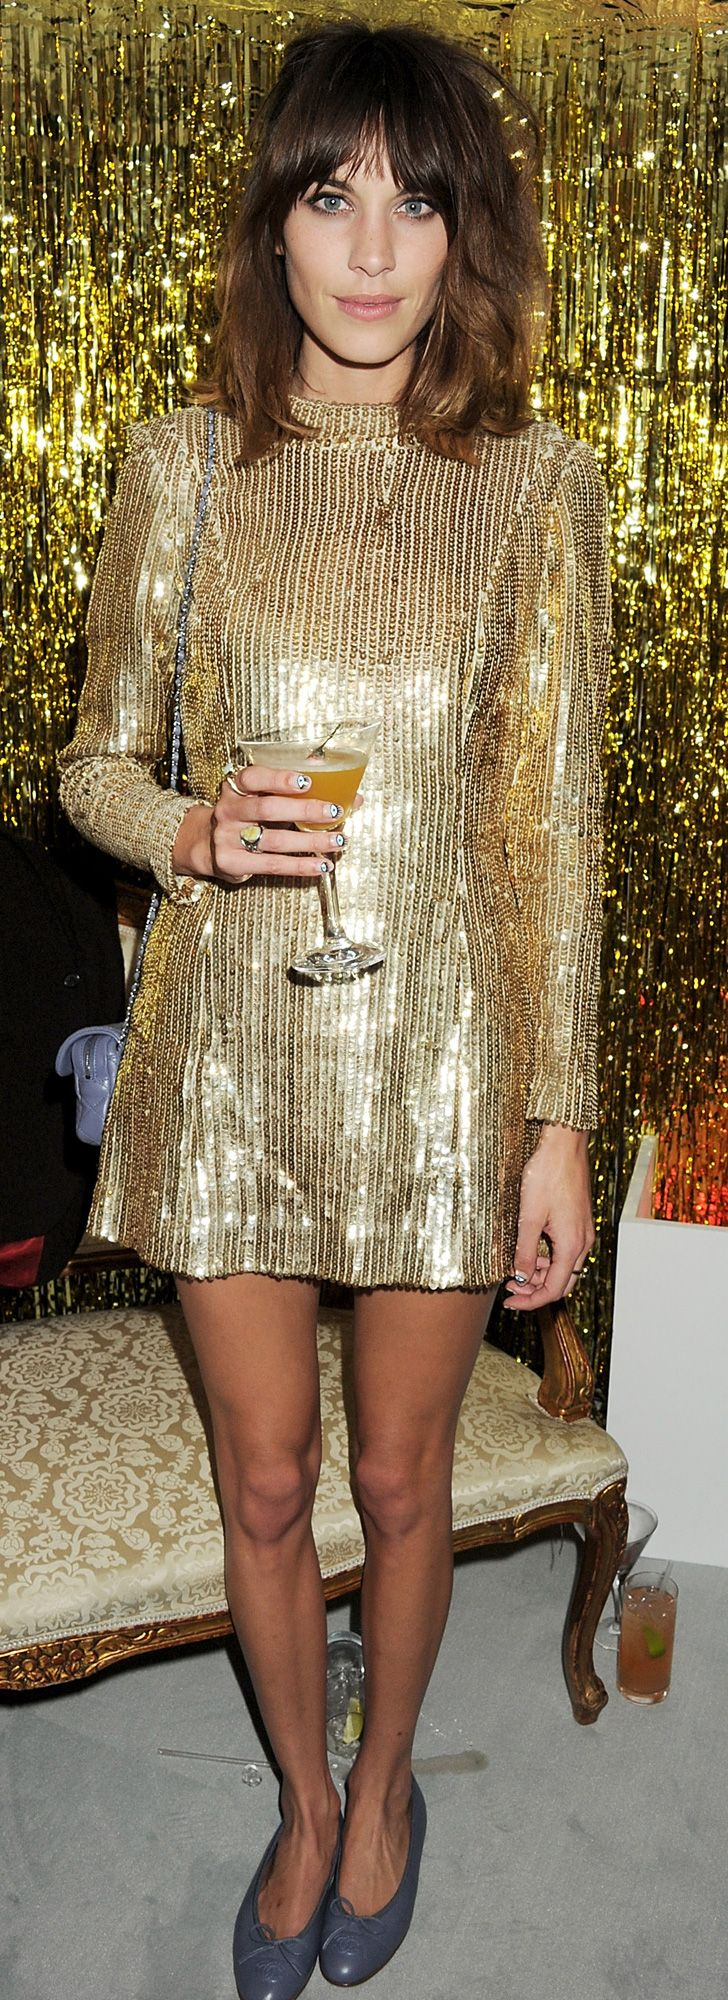 If We Could Raid Alexa Chung's Closet, We'd Take This Dress